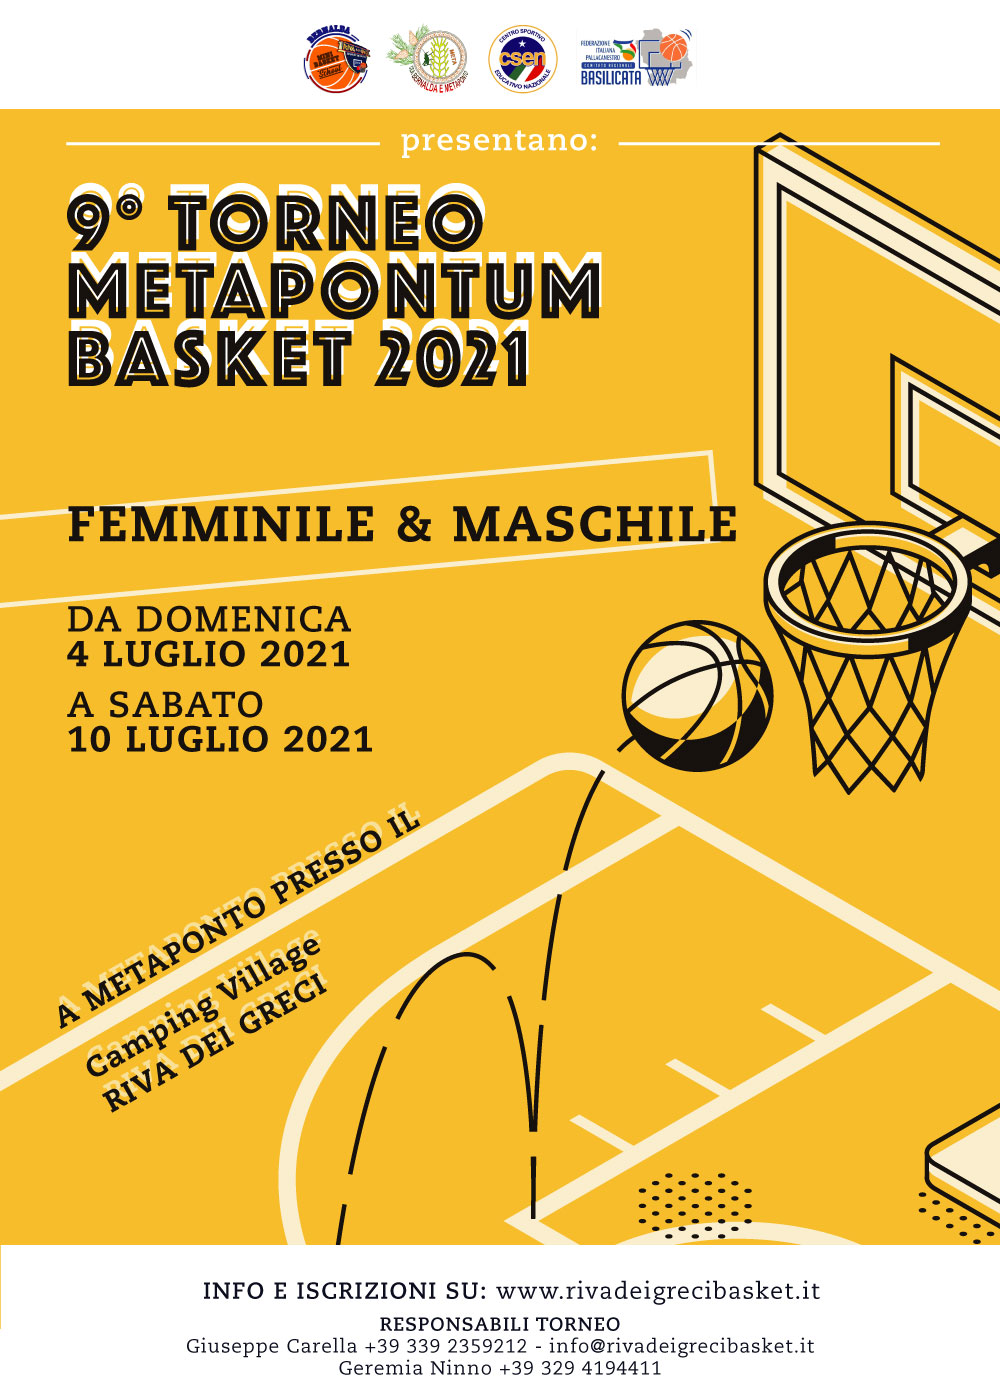 locandina-torneo-metapontum-2021